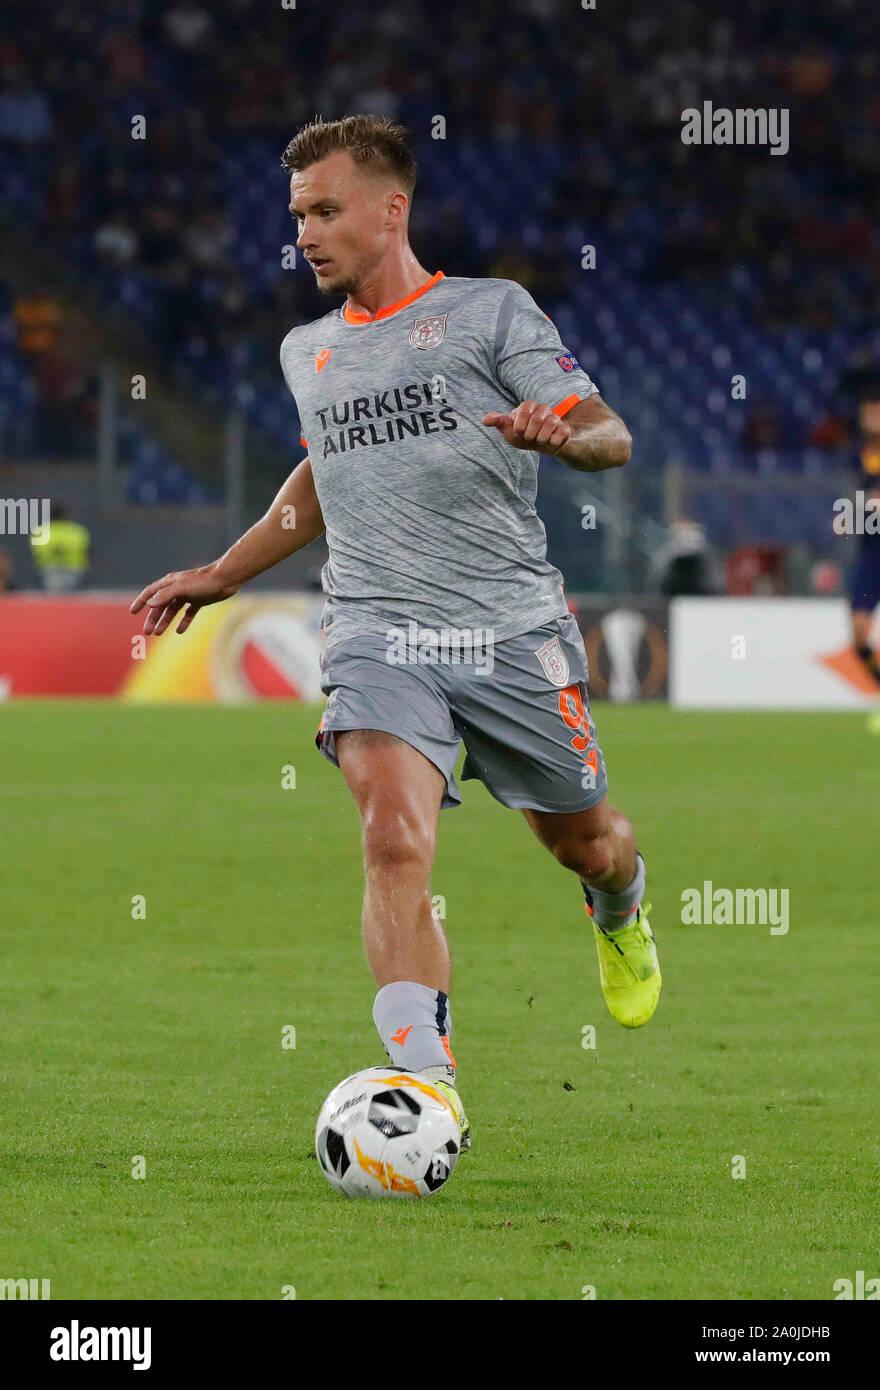 Fredrik Gulbrandsen during the Europa League Group stage soccer match  between AS Roma - Instabul Basaksehir at